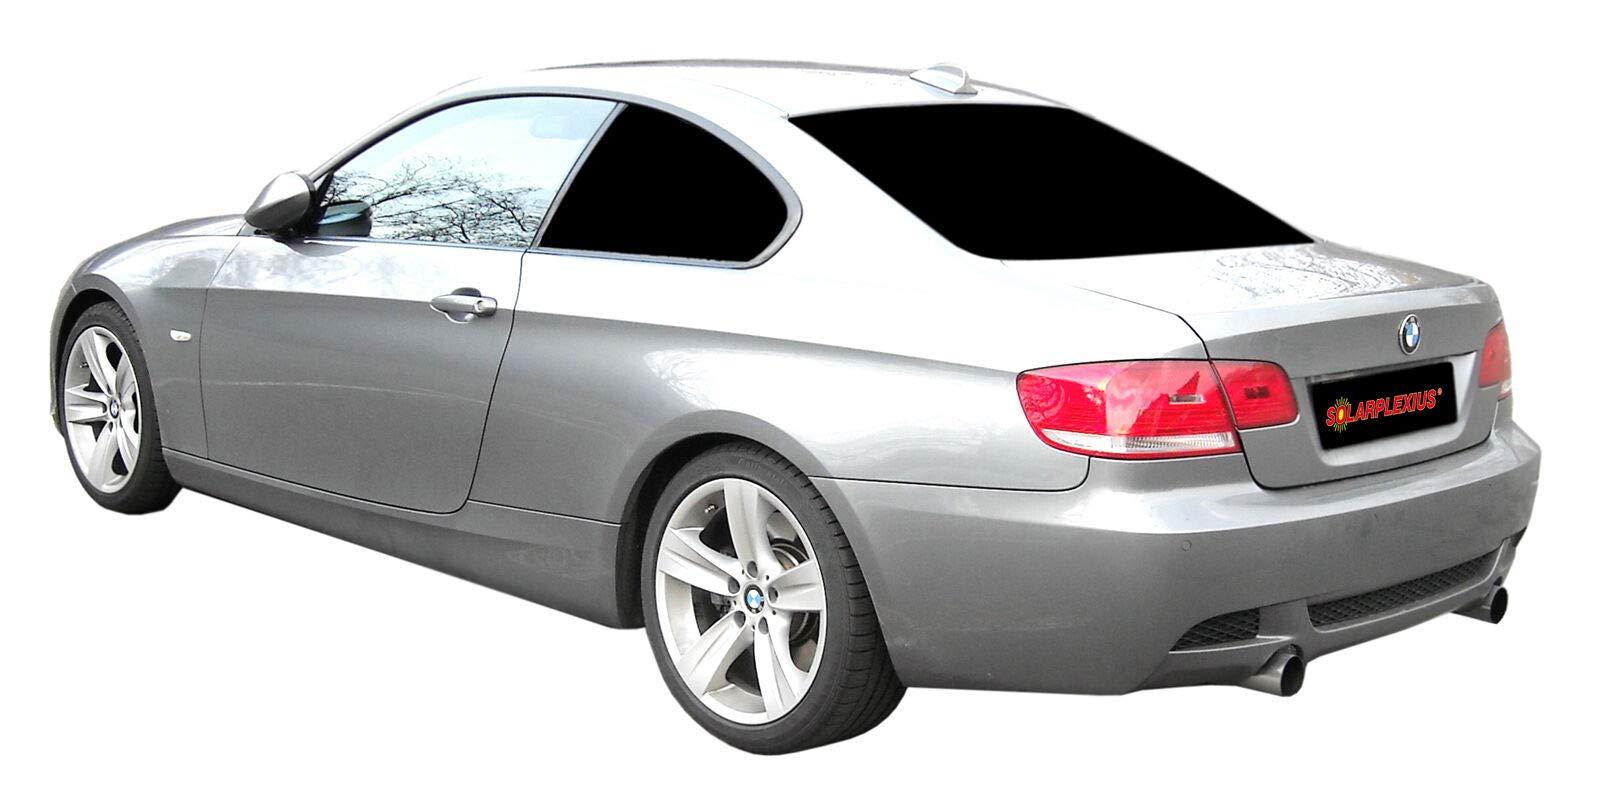 Auto Sonnenschutz Scheiben-Tönung Sonnenblenden  AUDI A6 Avant 4B C5 Bj.98-05